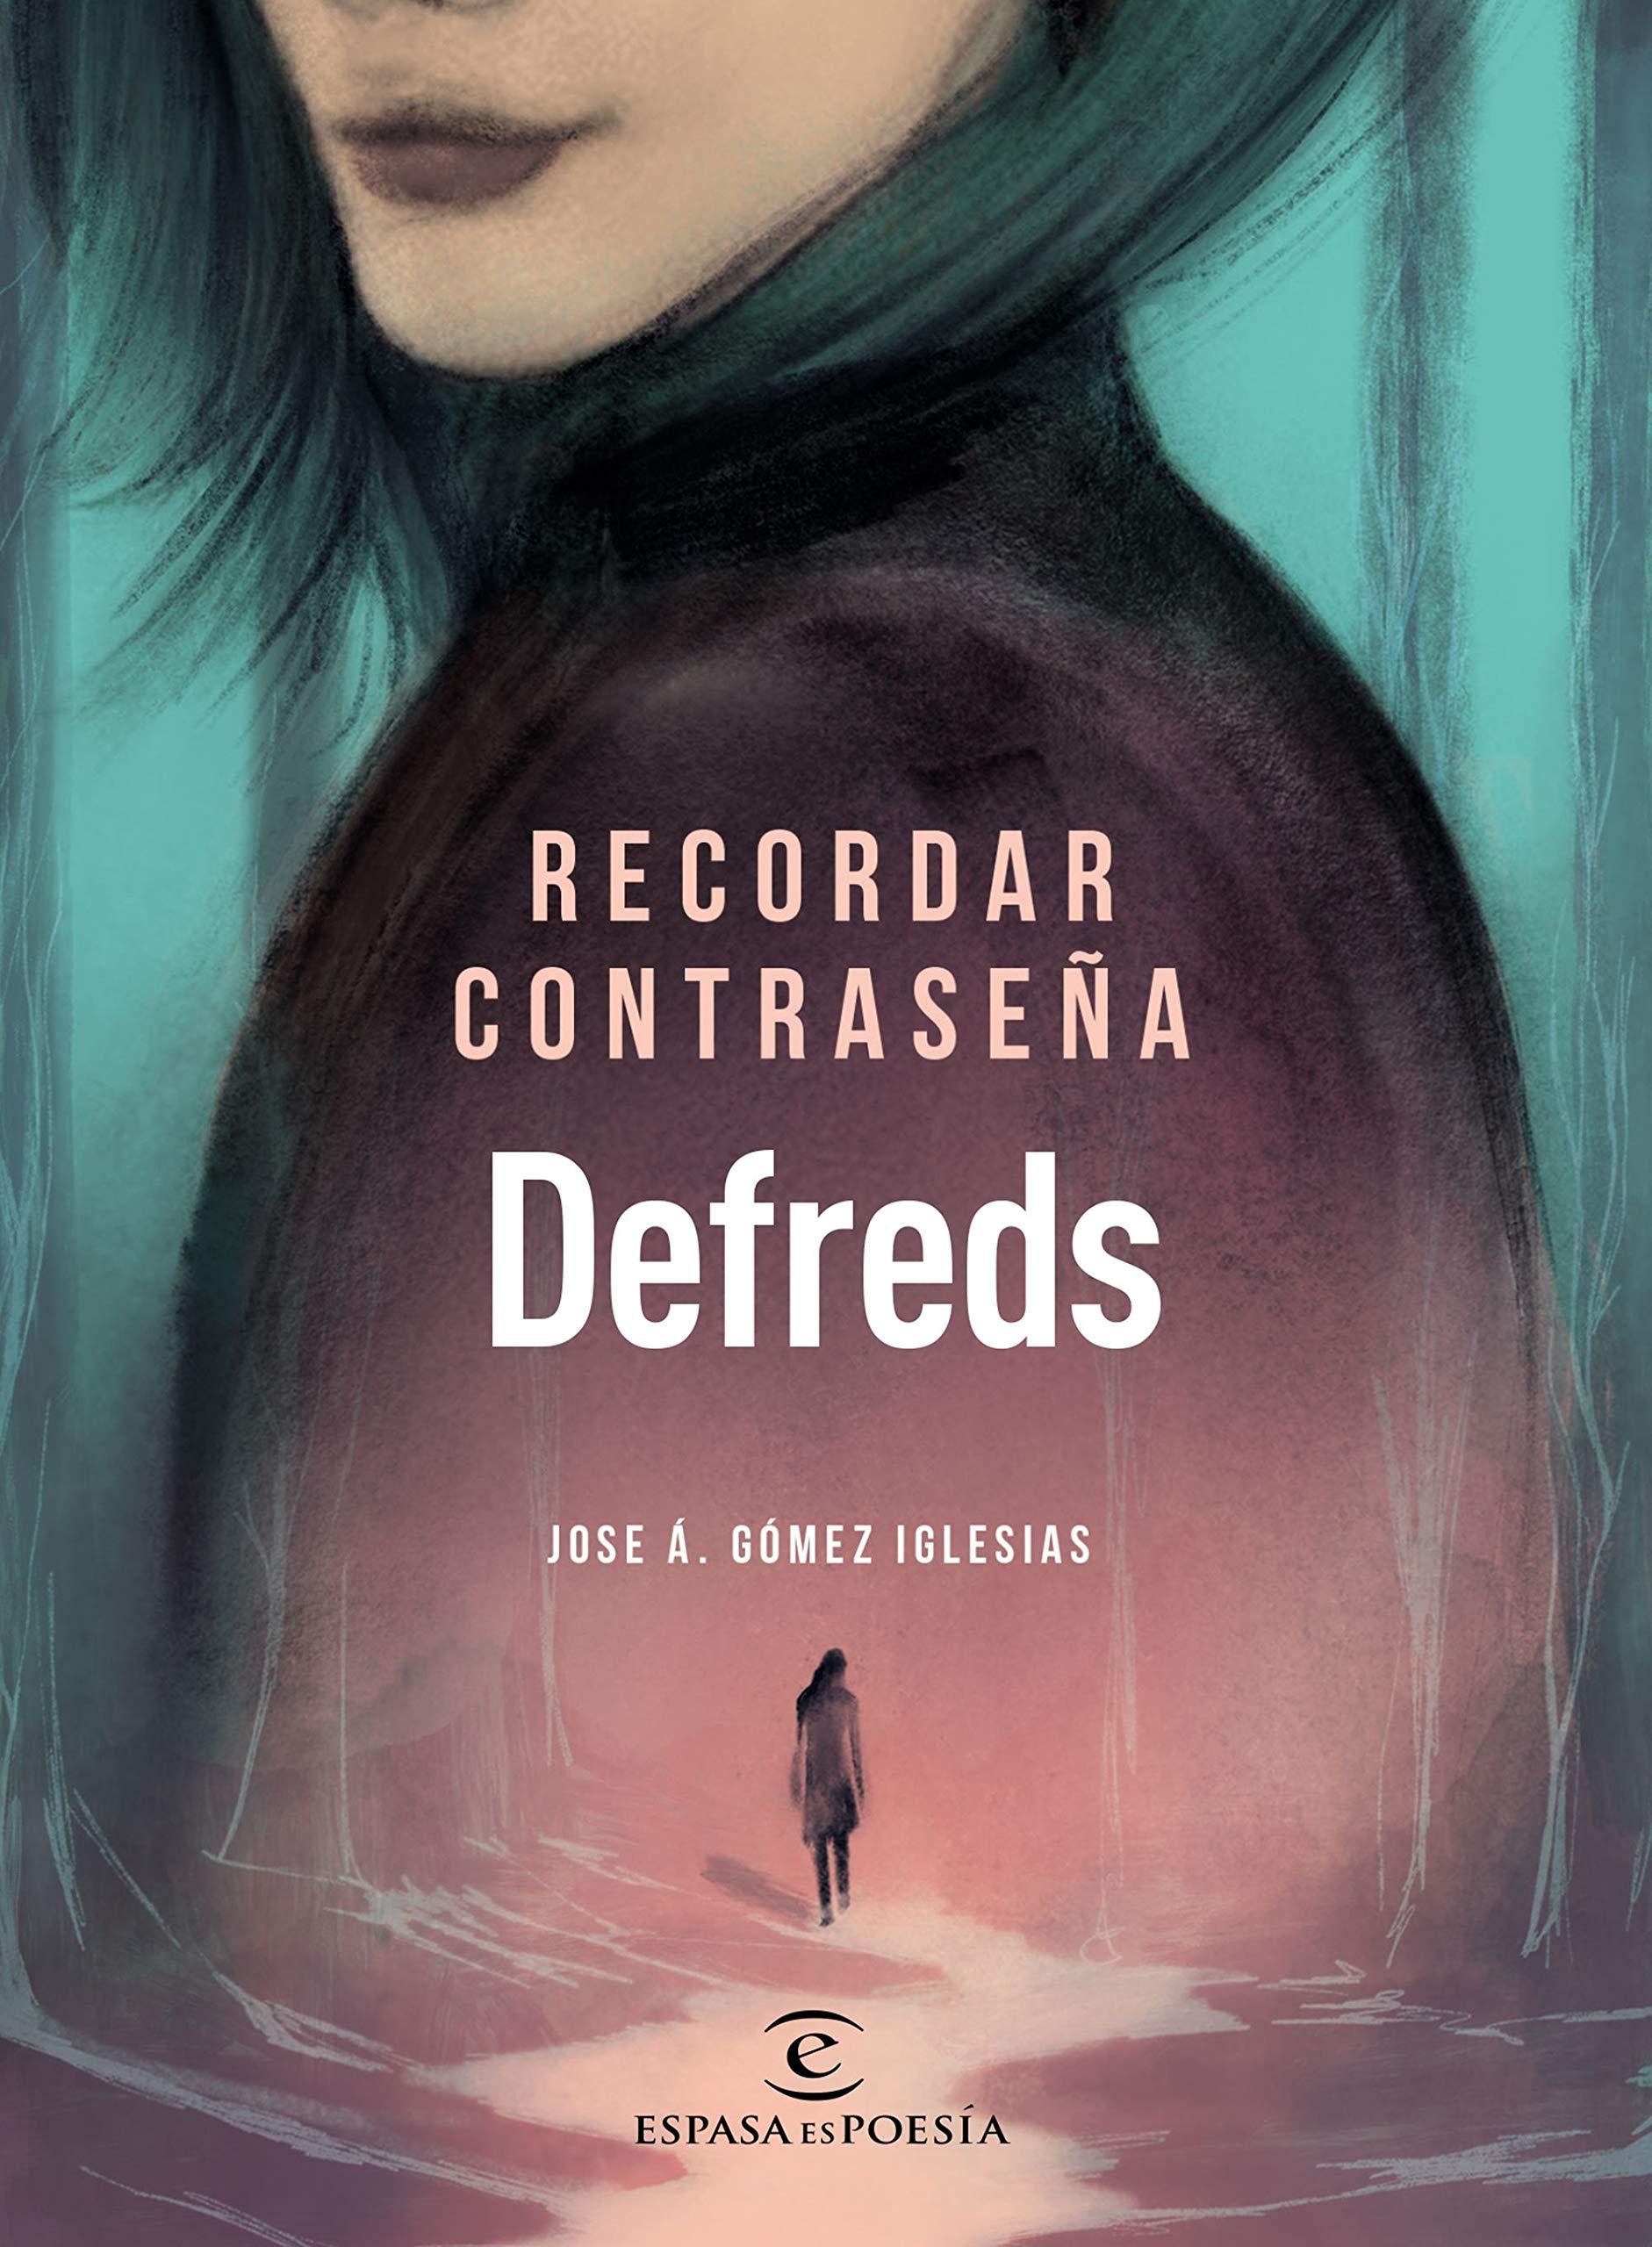 Recordar contraseña (ESPASAesPOESÍA): Amazon.es: Defreds - Jose Á. Gómez  Iglesias: Libros